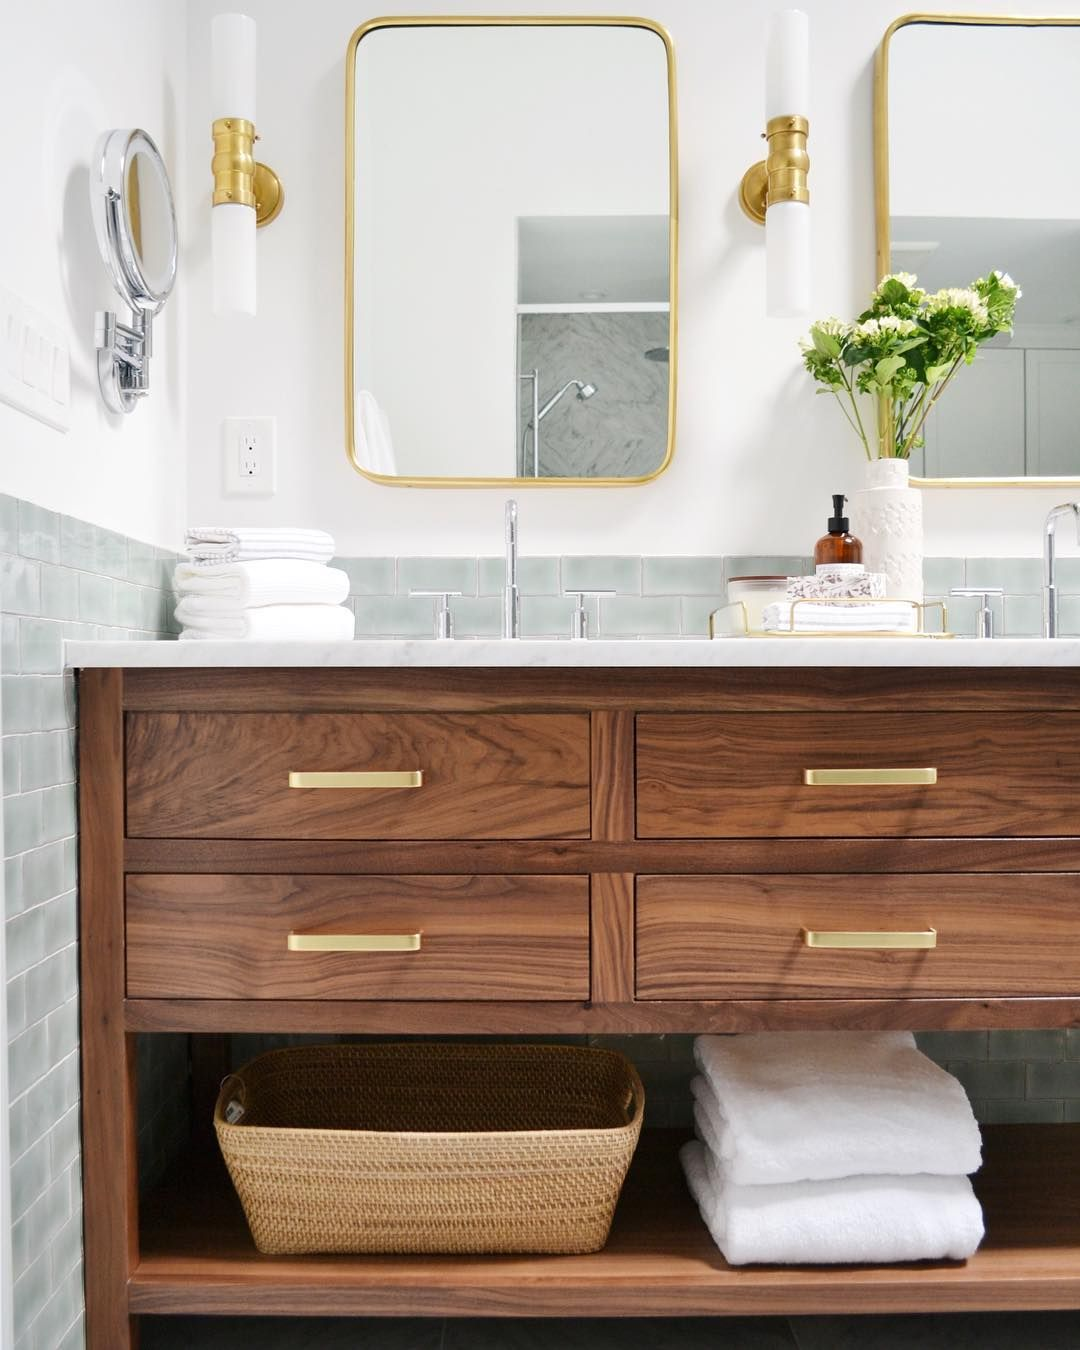 Bathroom Vanity With Gold Drawer Pulls